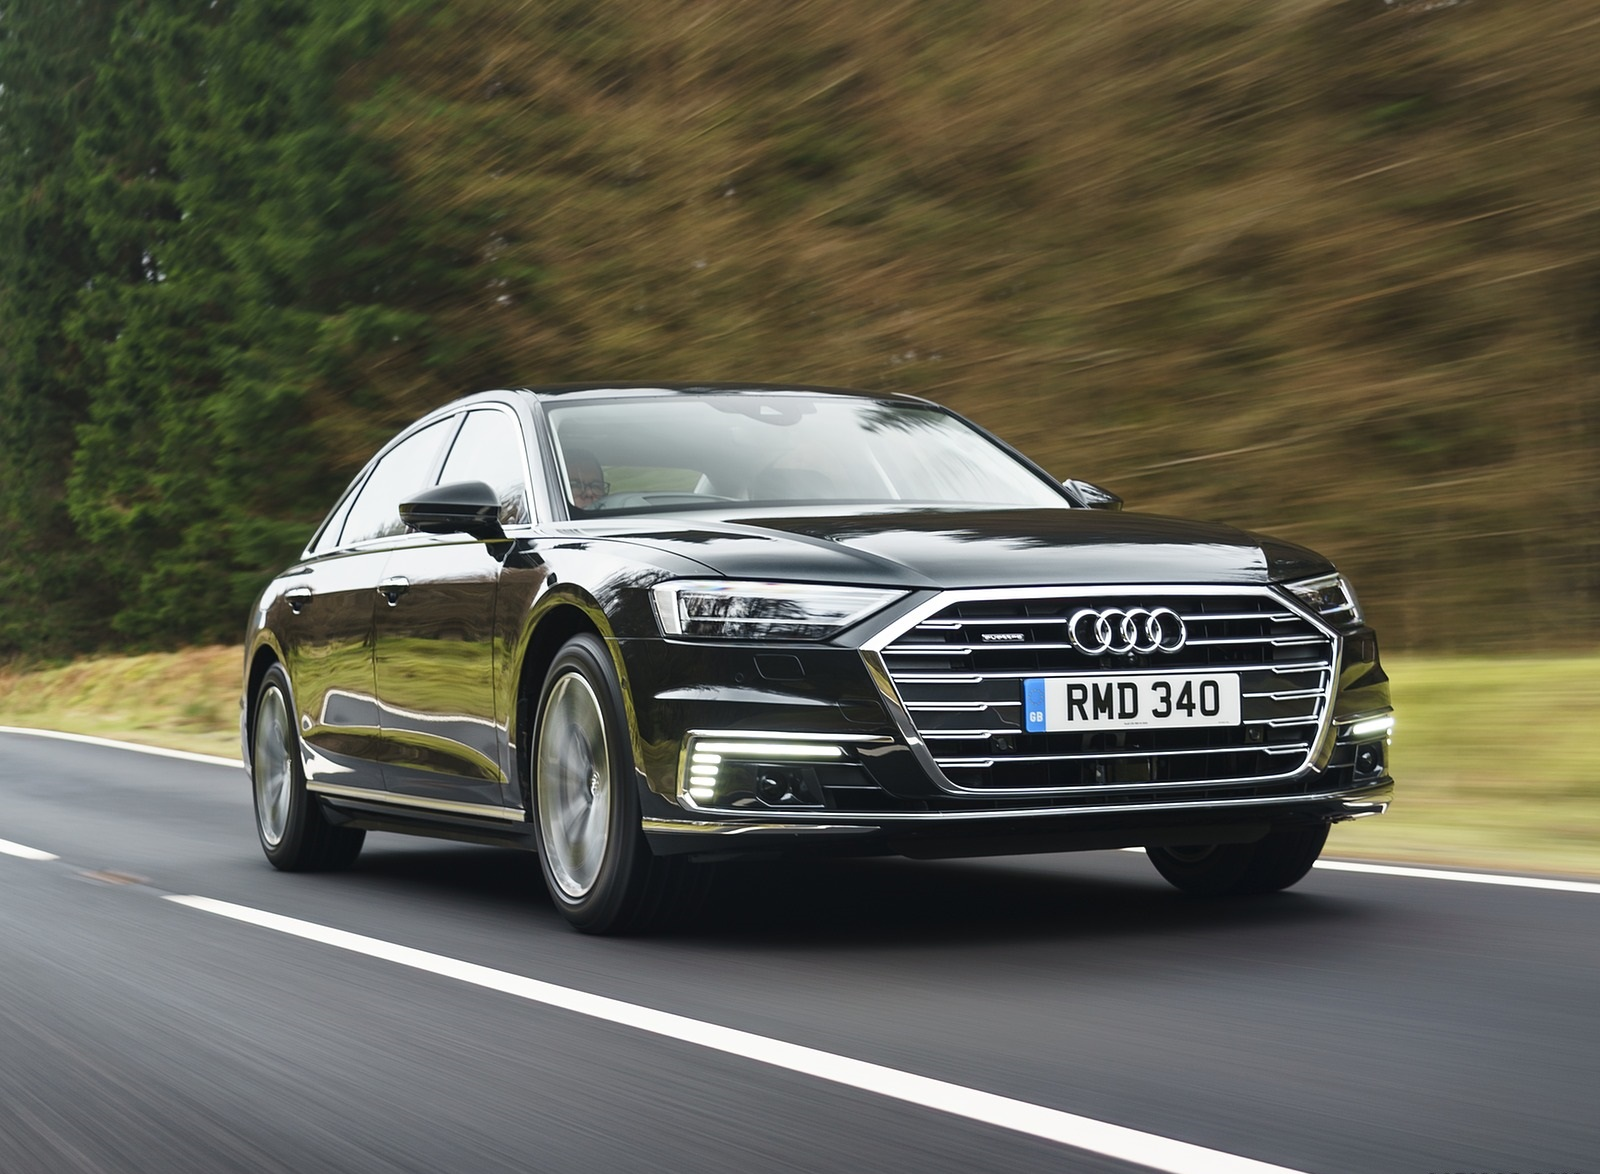 2020 Audi A8 L 60 TFSI e quattro (Plug-In Hybrid UK-Spec) Front Three-Quarter Wallpapers (1)